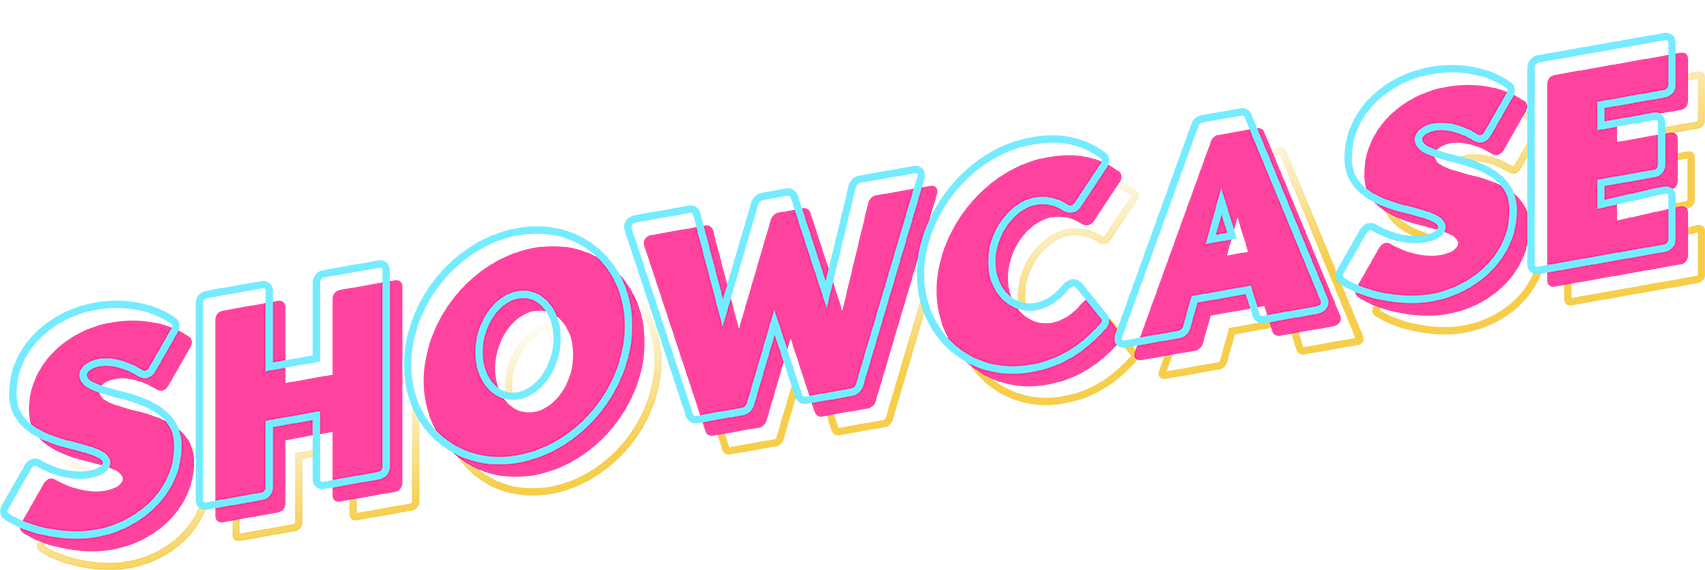 H-Rez Showecase Logo